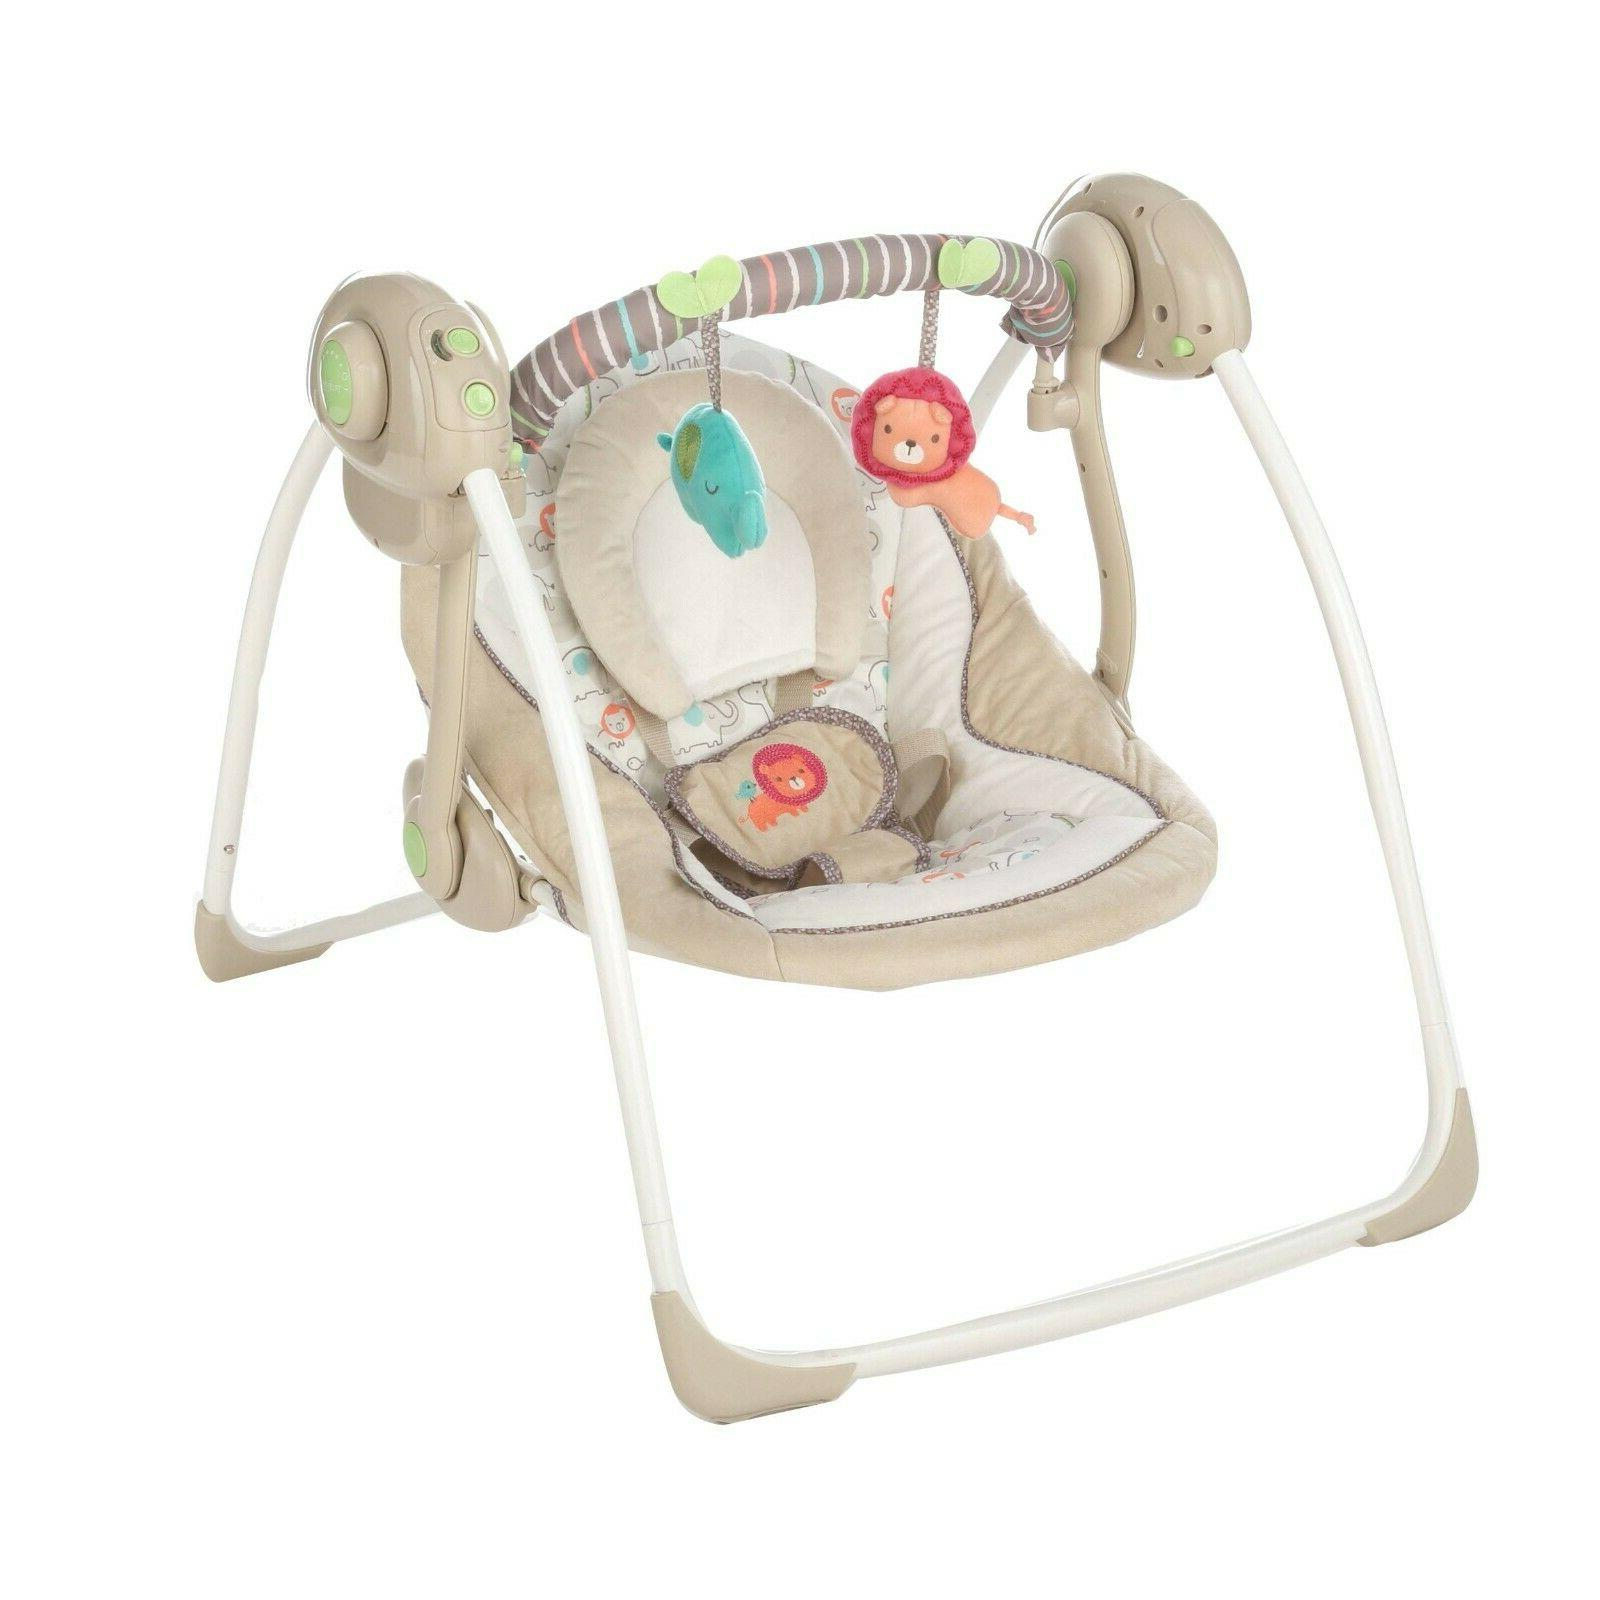 Baby Swing Seat Rocker Electric Sounds